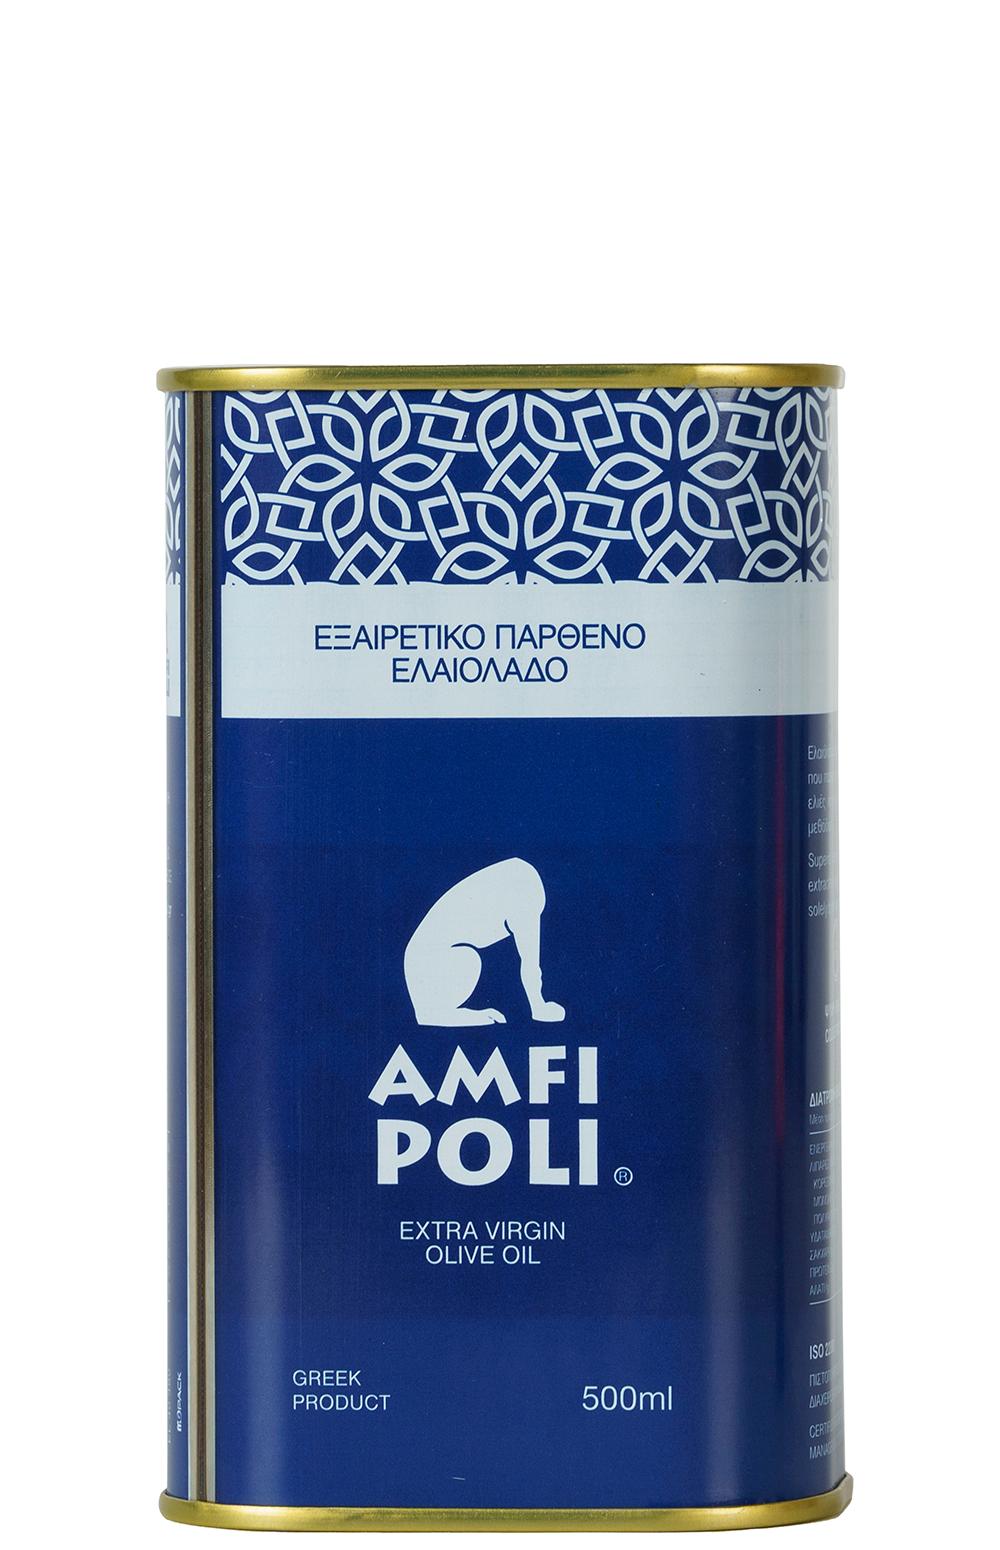 Amfipoli